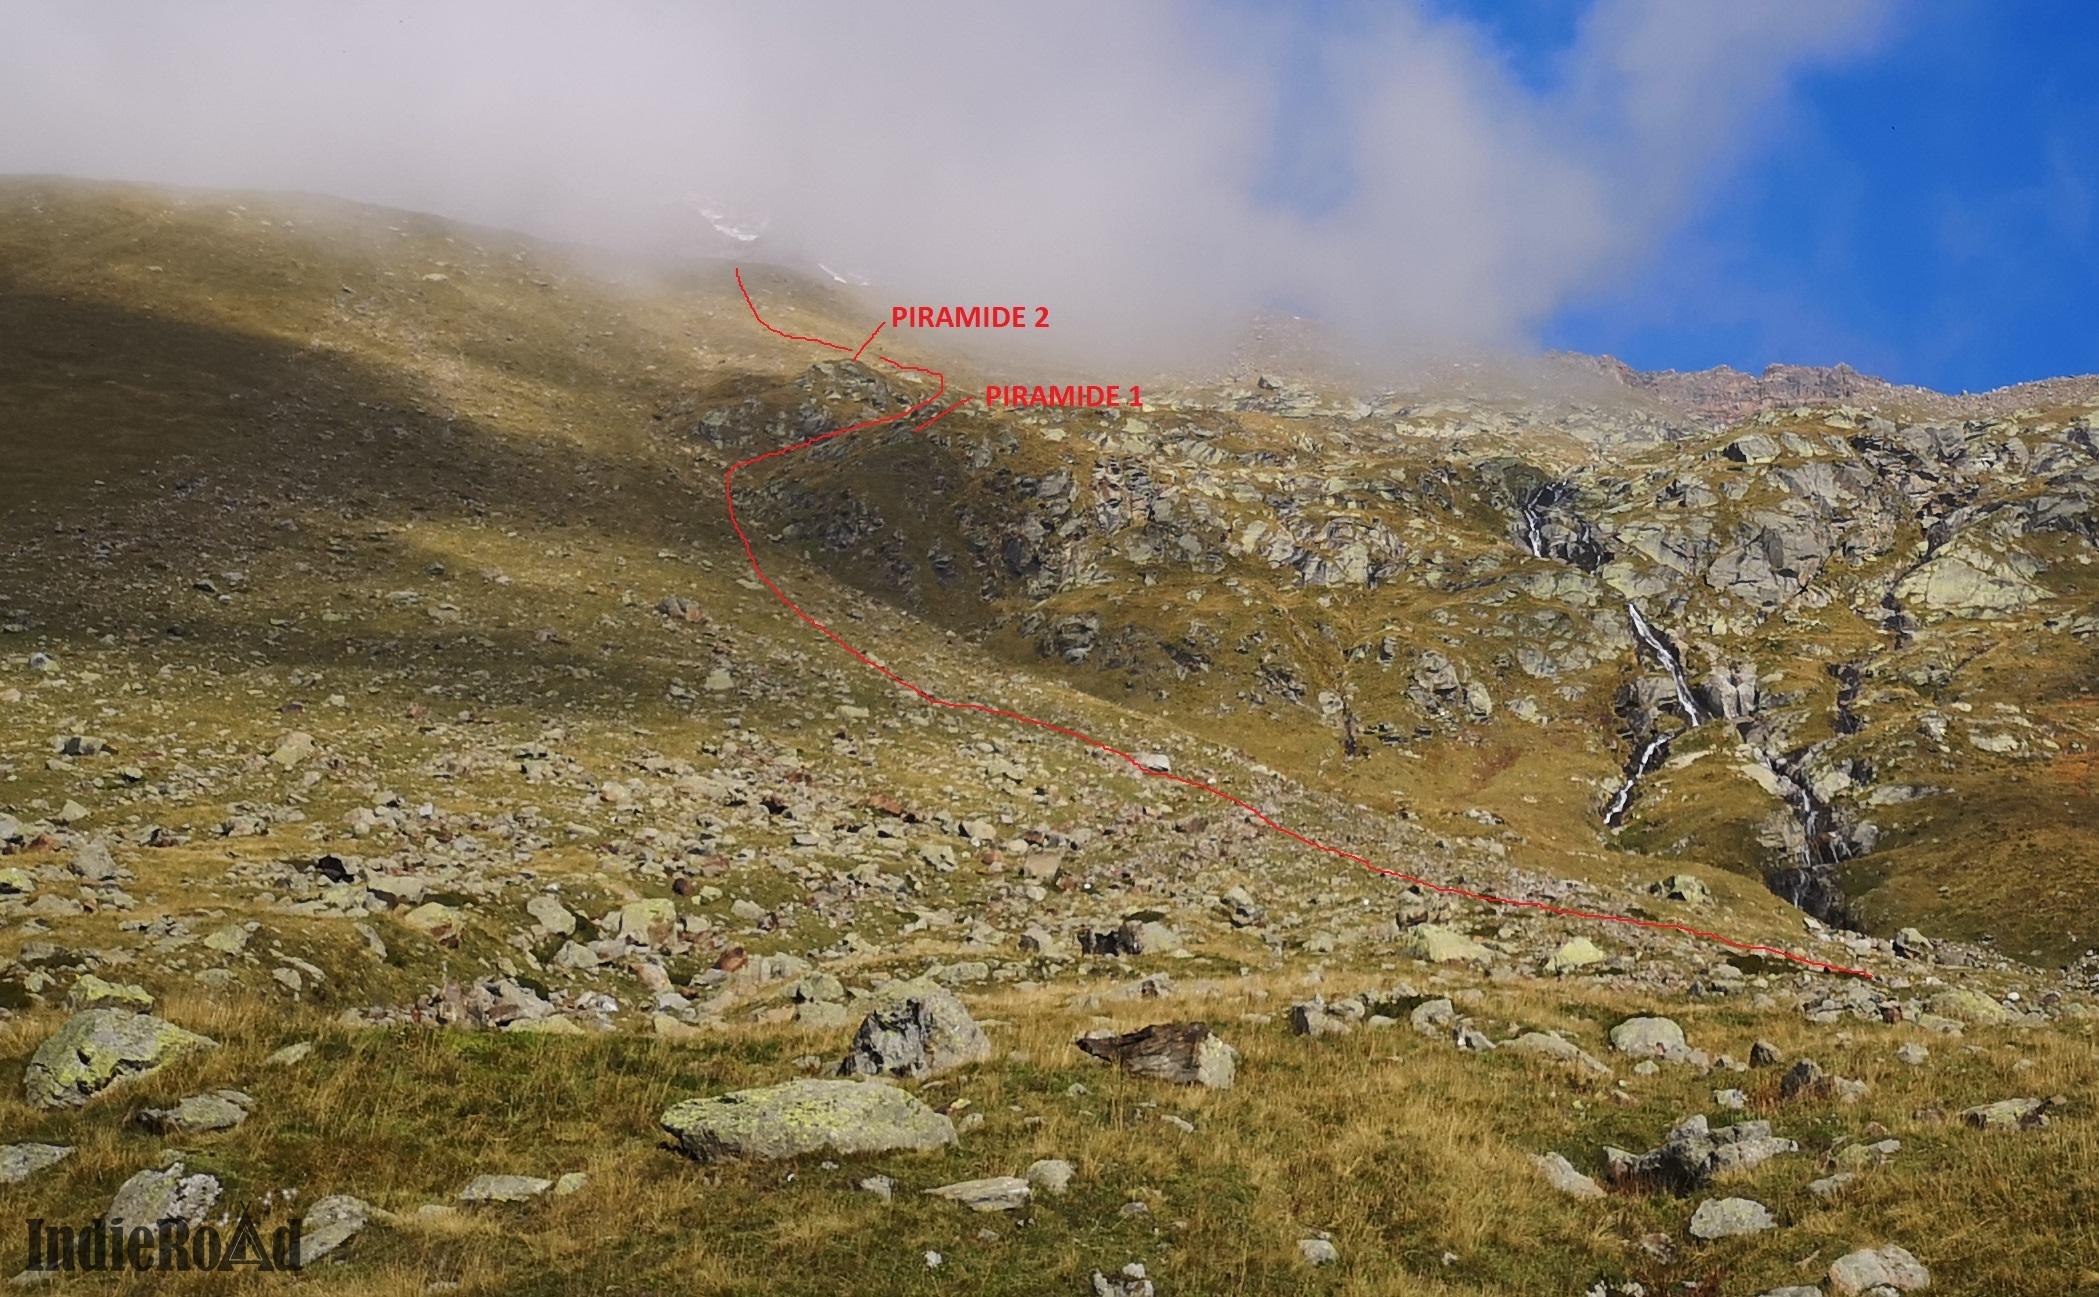 CAPANNA Resegotti monte rosa gpx trekking